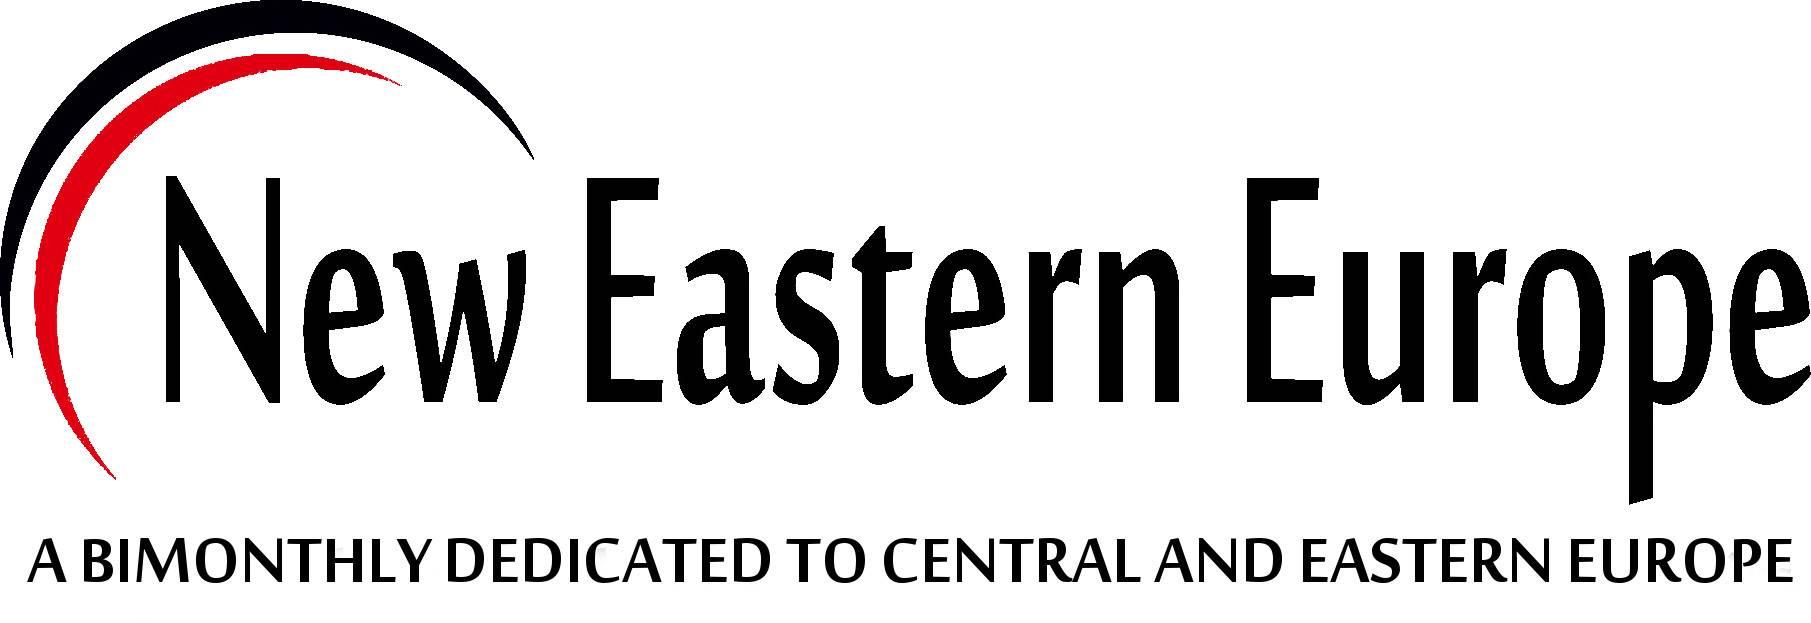 Logo of New Eastern Europe